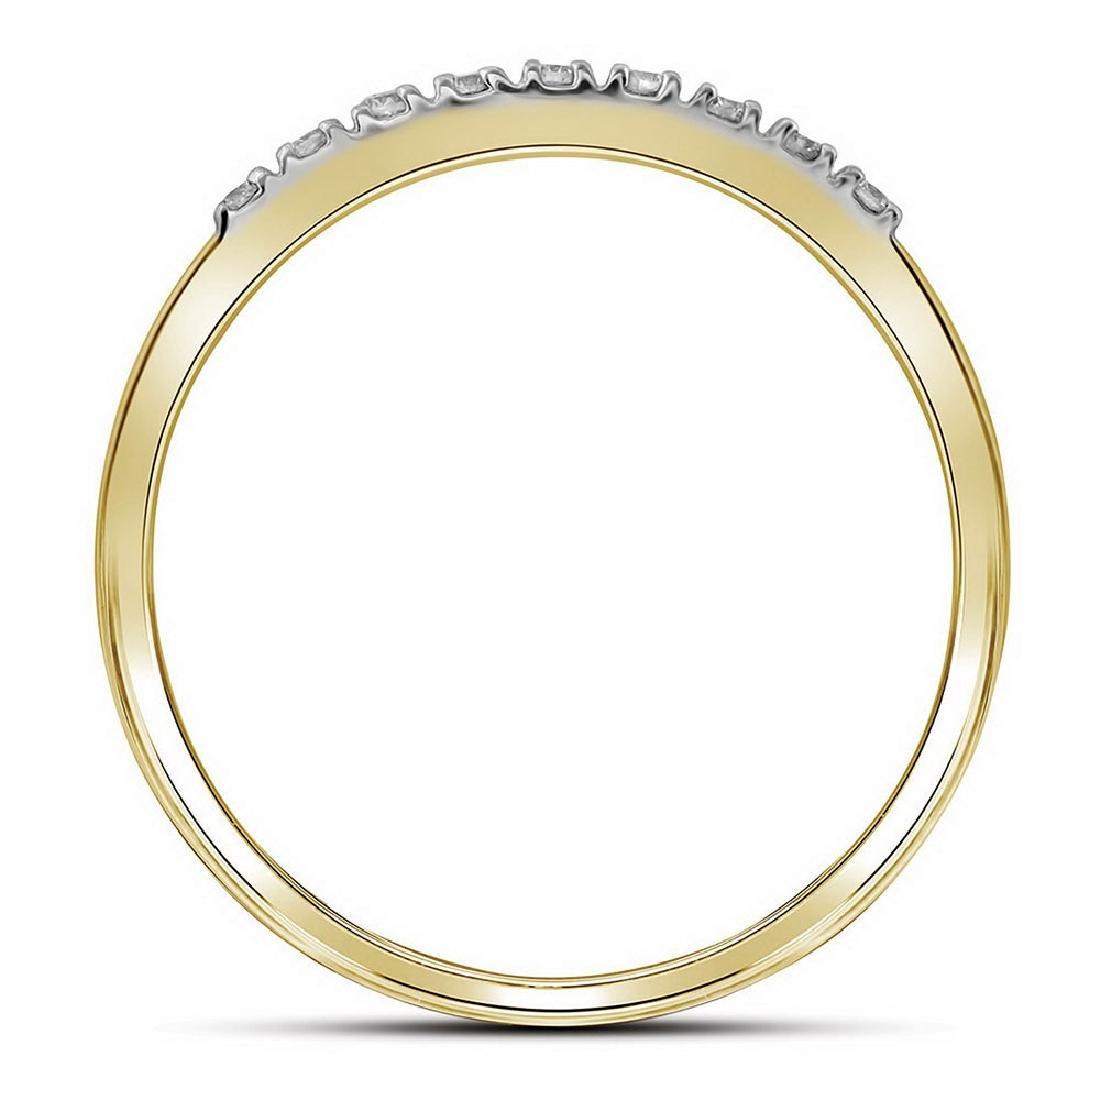 10kt Yellow Gold Round Diamond Square Bridal Wedding Ri - 3